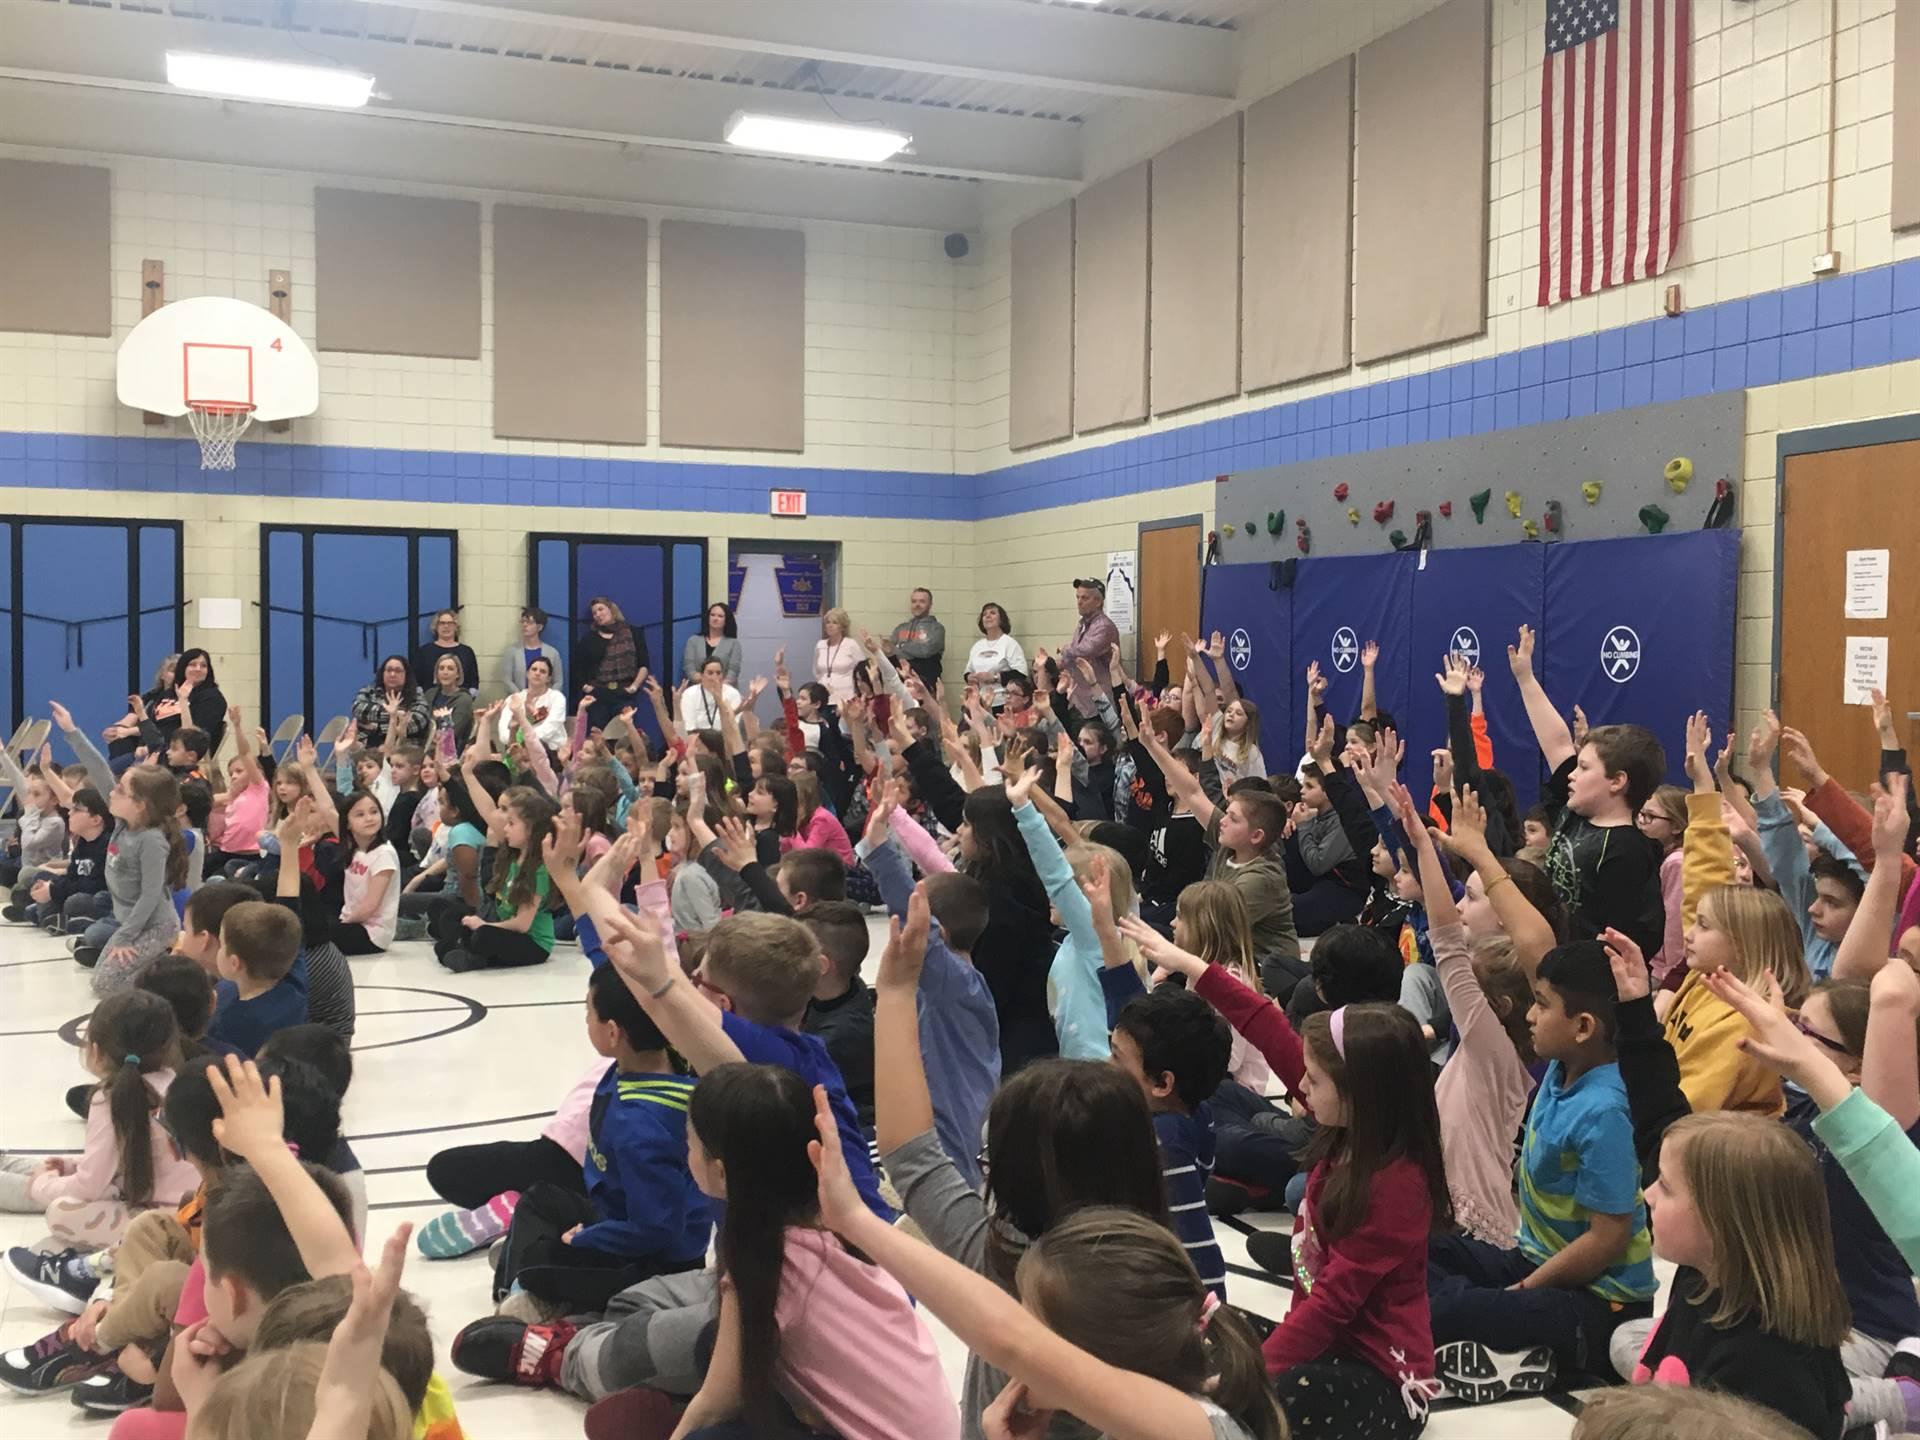 Students raising their hands at the kickoff assembly